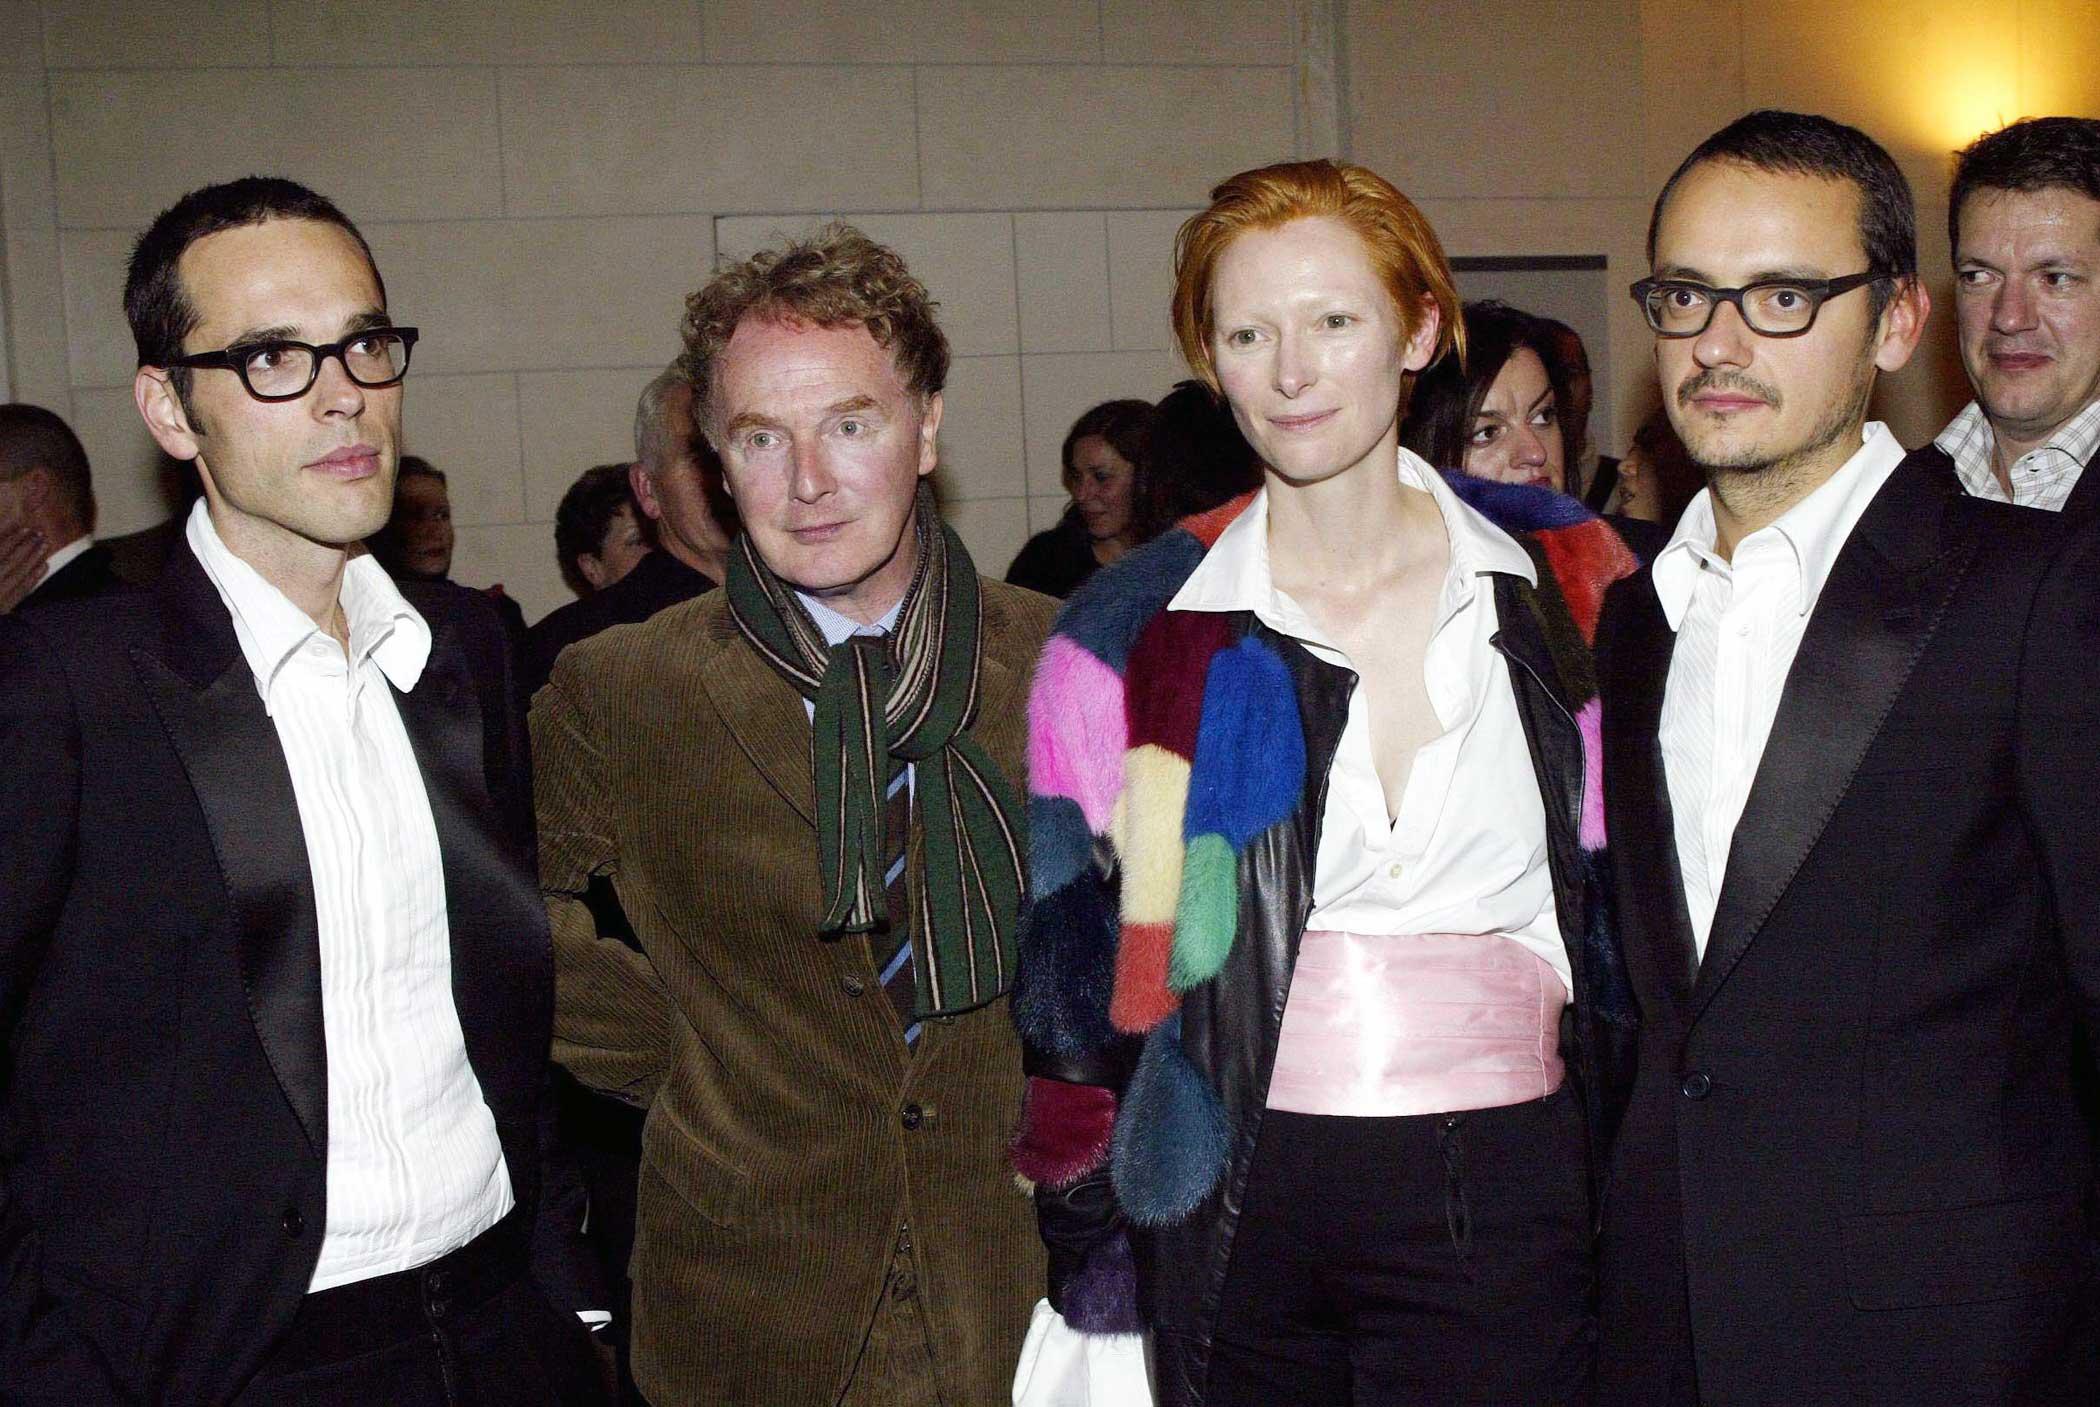 Malcom McLaren, second from left, Tilda Swinton, and Viktor & Rolf on Aug. 10, 2003 in Paris.